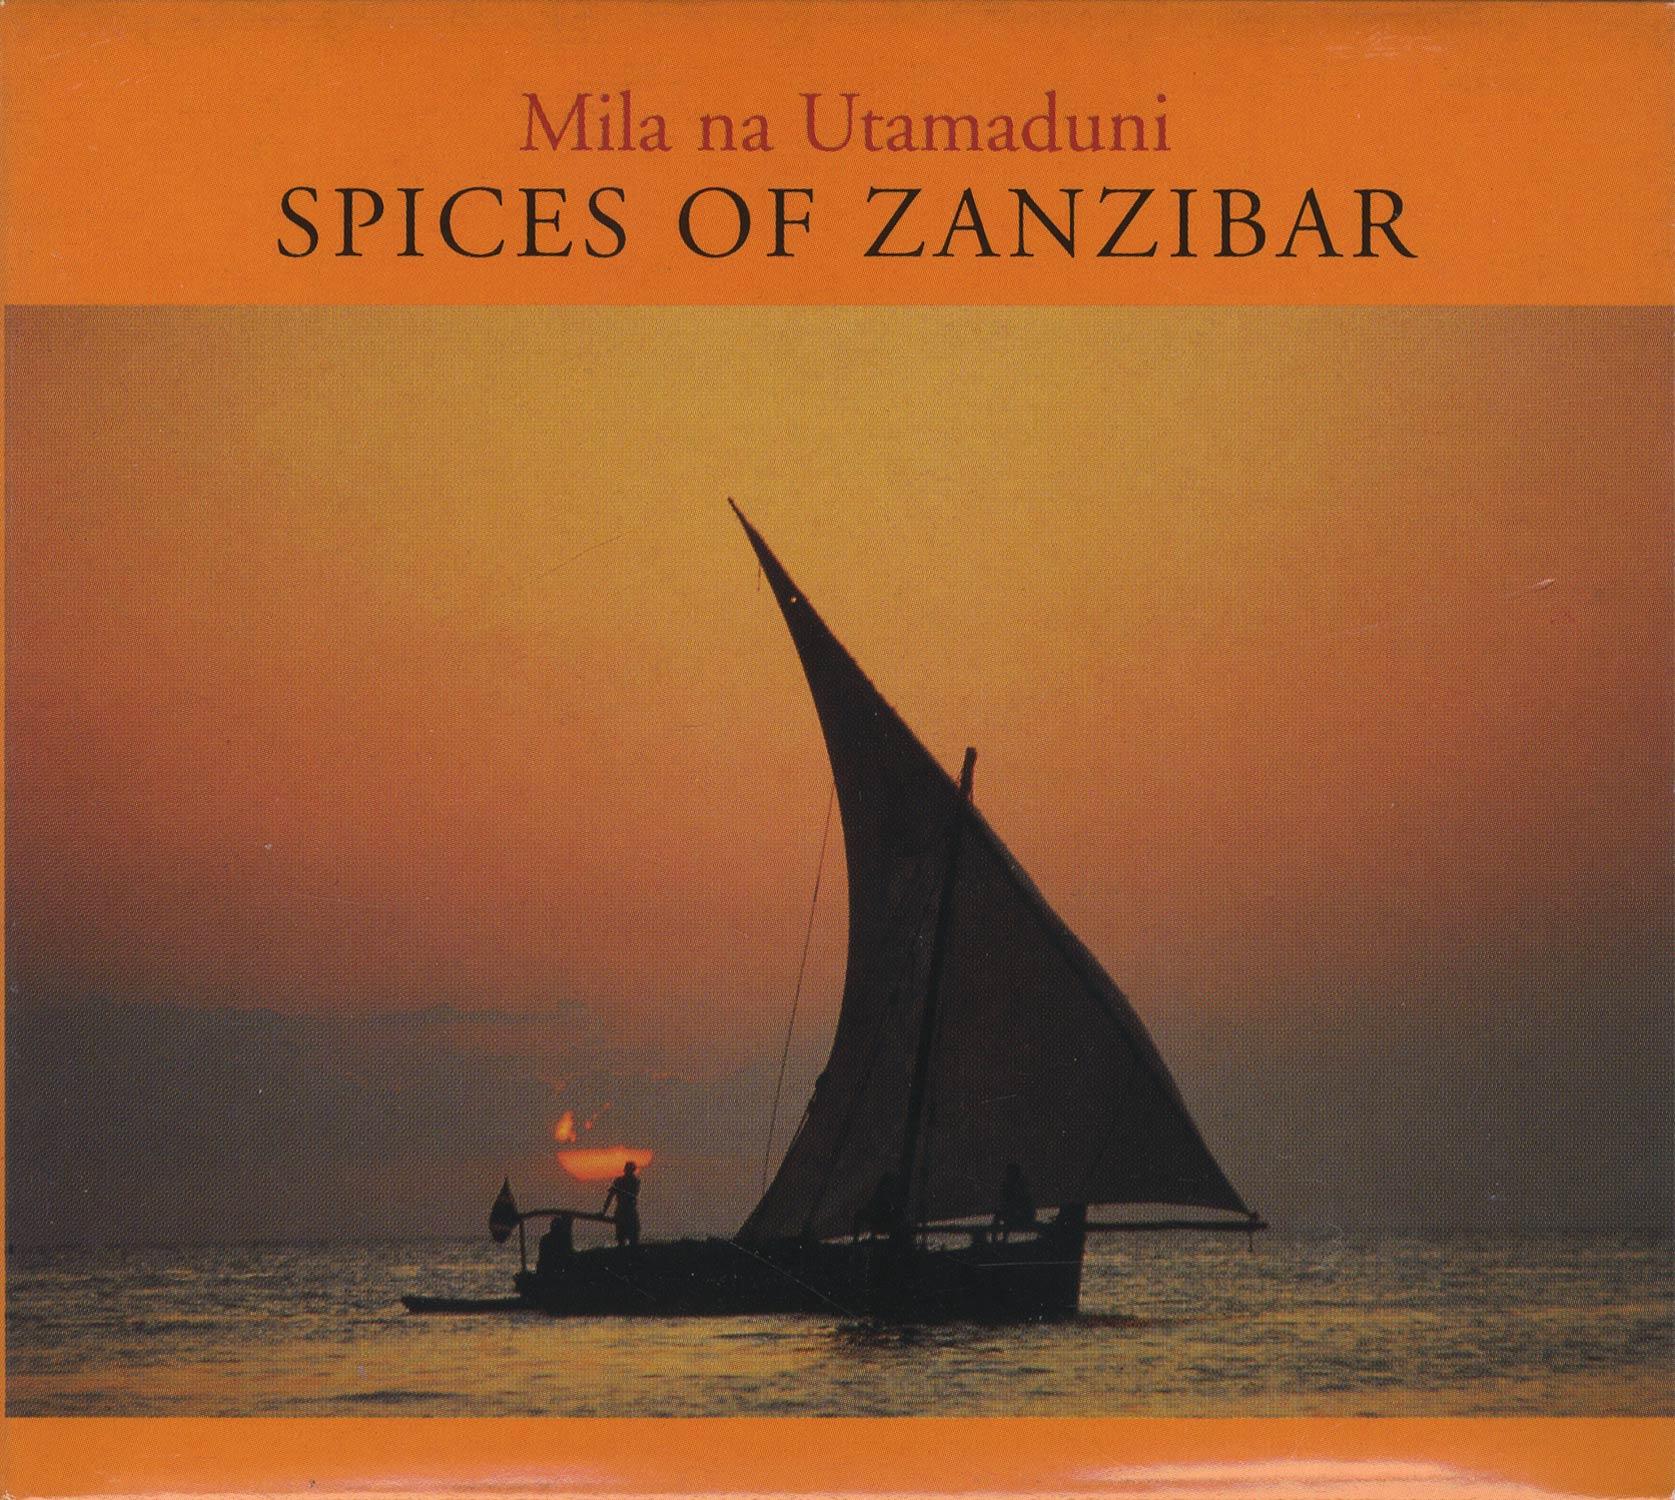 Spices of Zanzibar Mila na Utamaduni